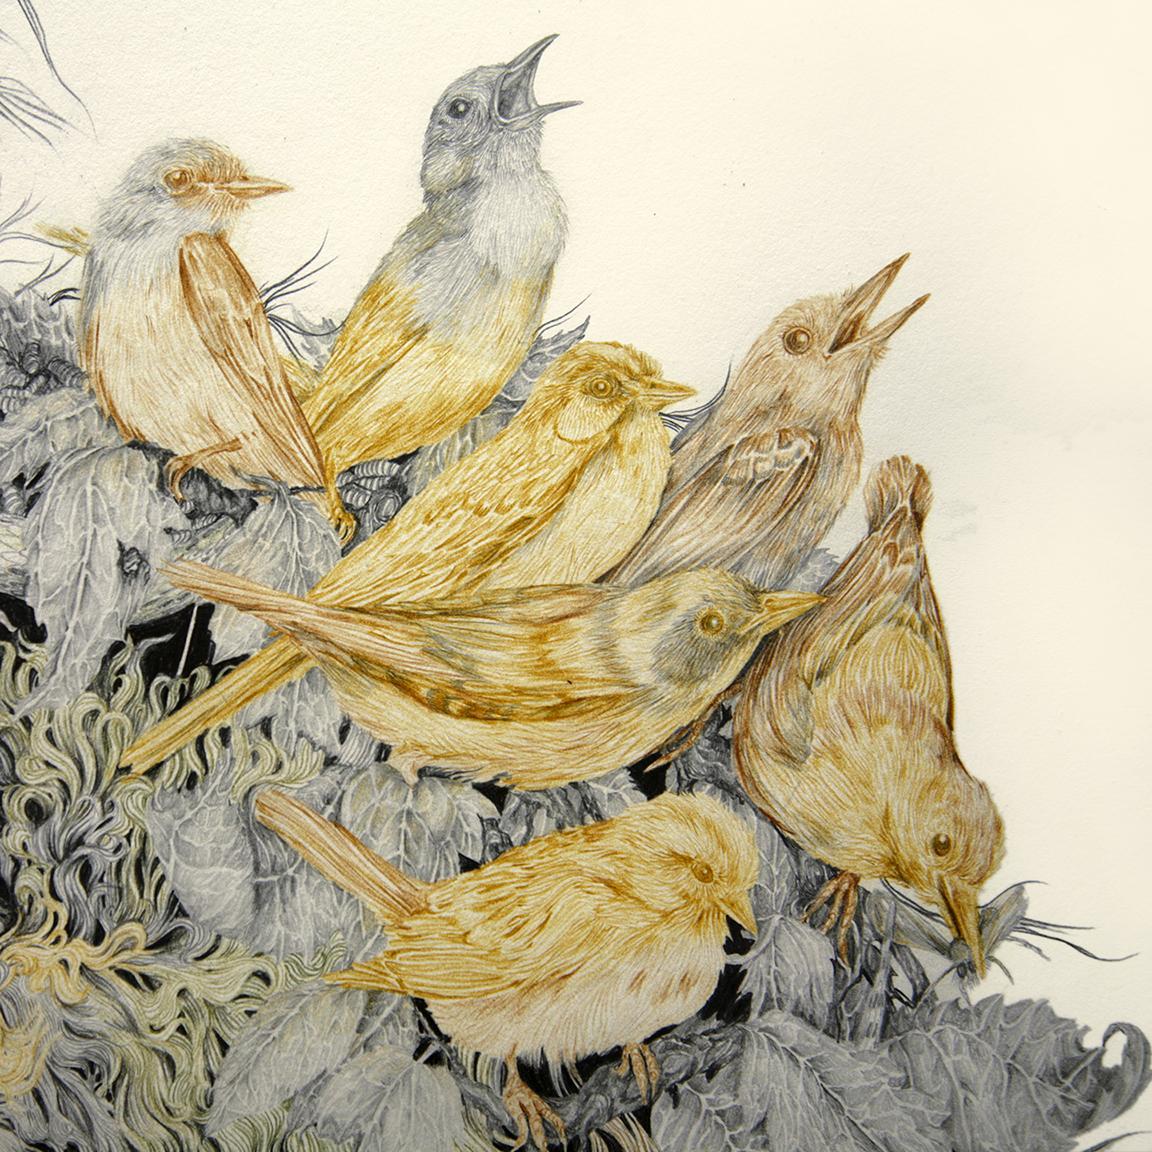 SuperNatural_Aurel_Schmidt_detail_birds.jpg